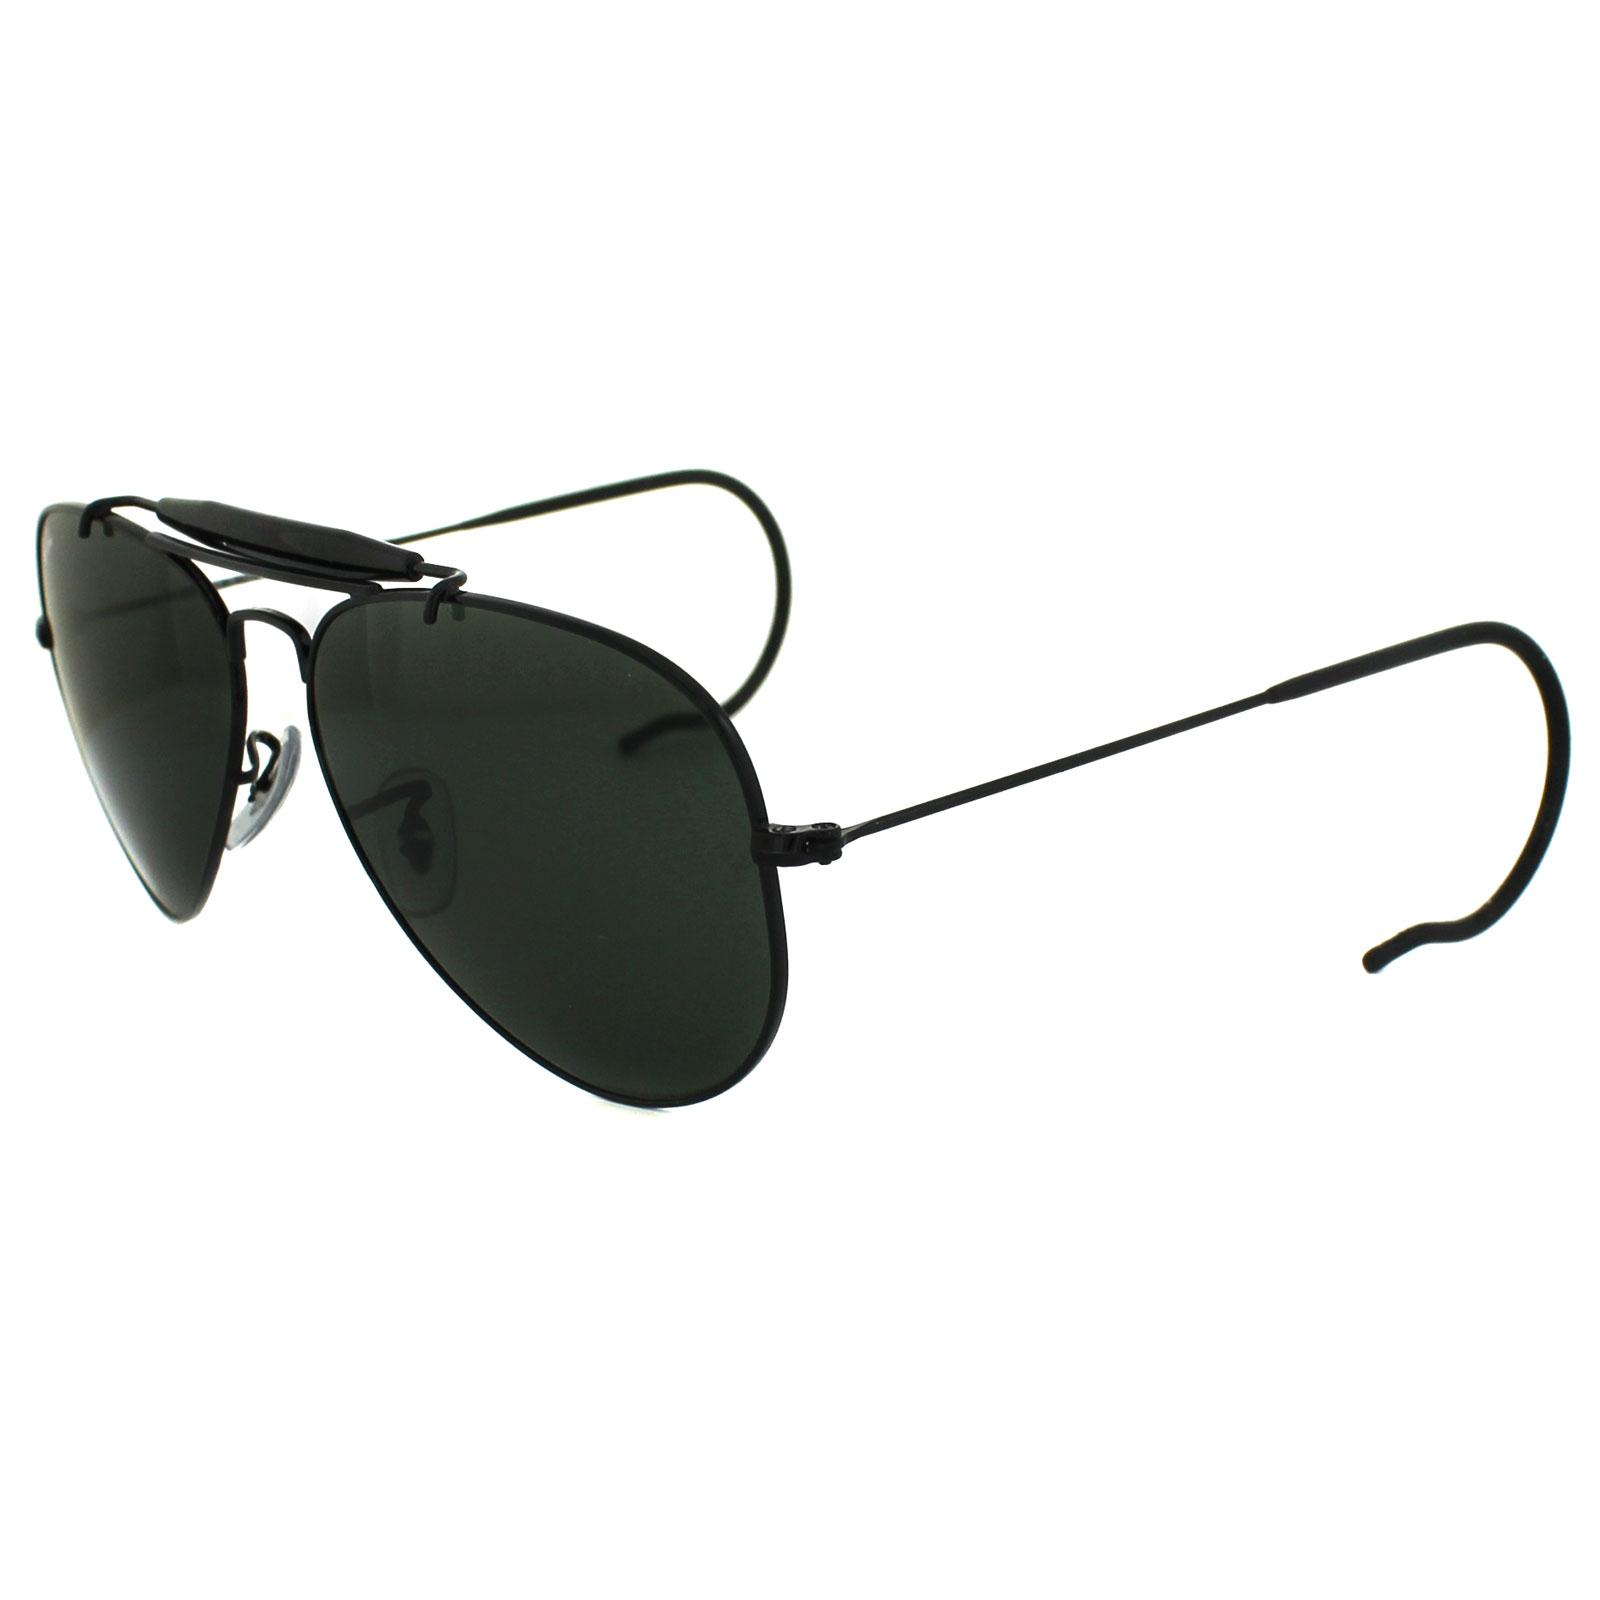 30754d8068 Ray Ban Sunglasses Aviator Outdoorsman Black Frame 3030 « Heritage Malta